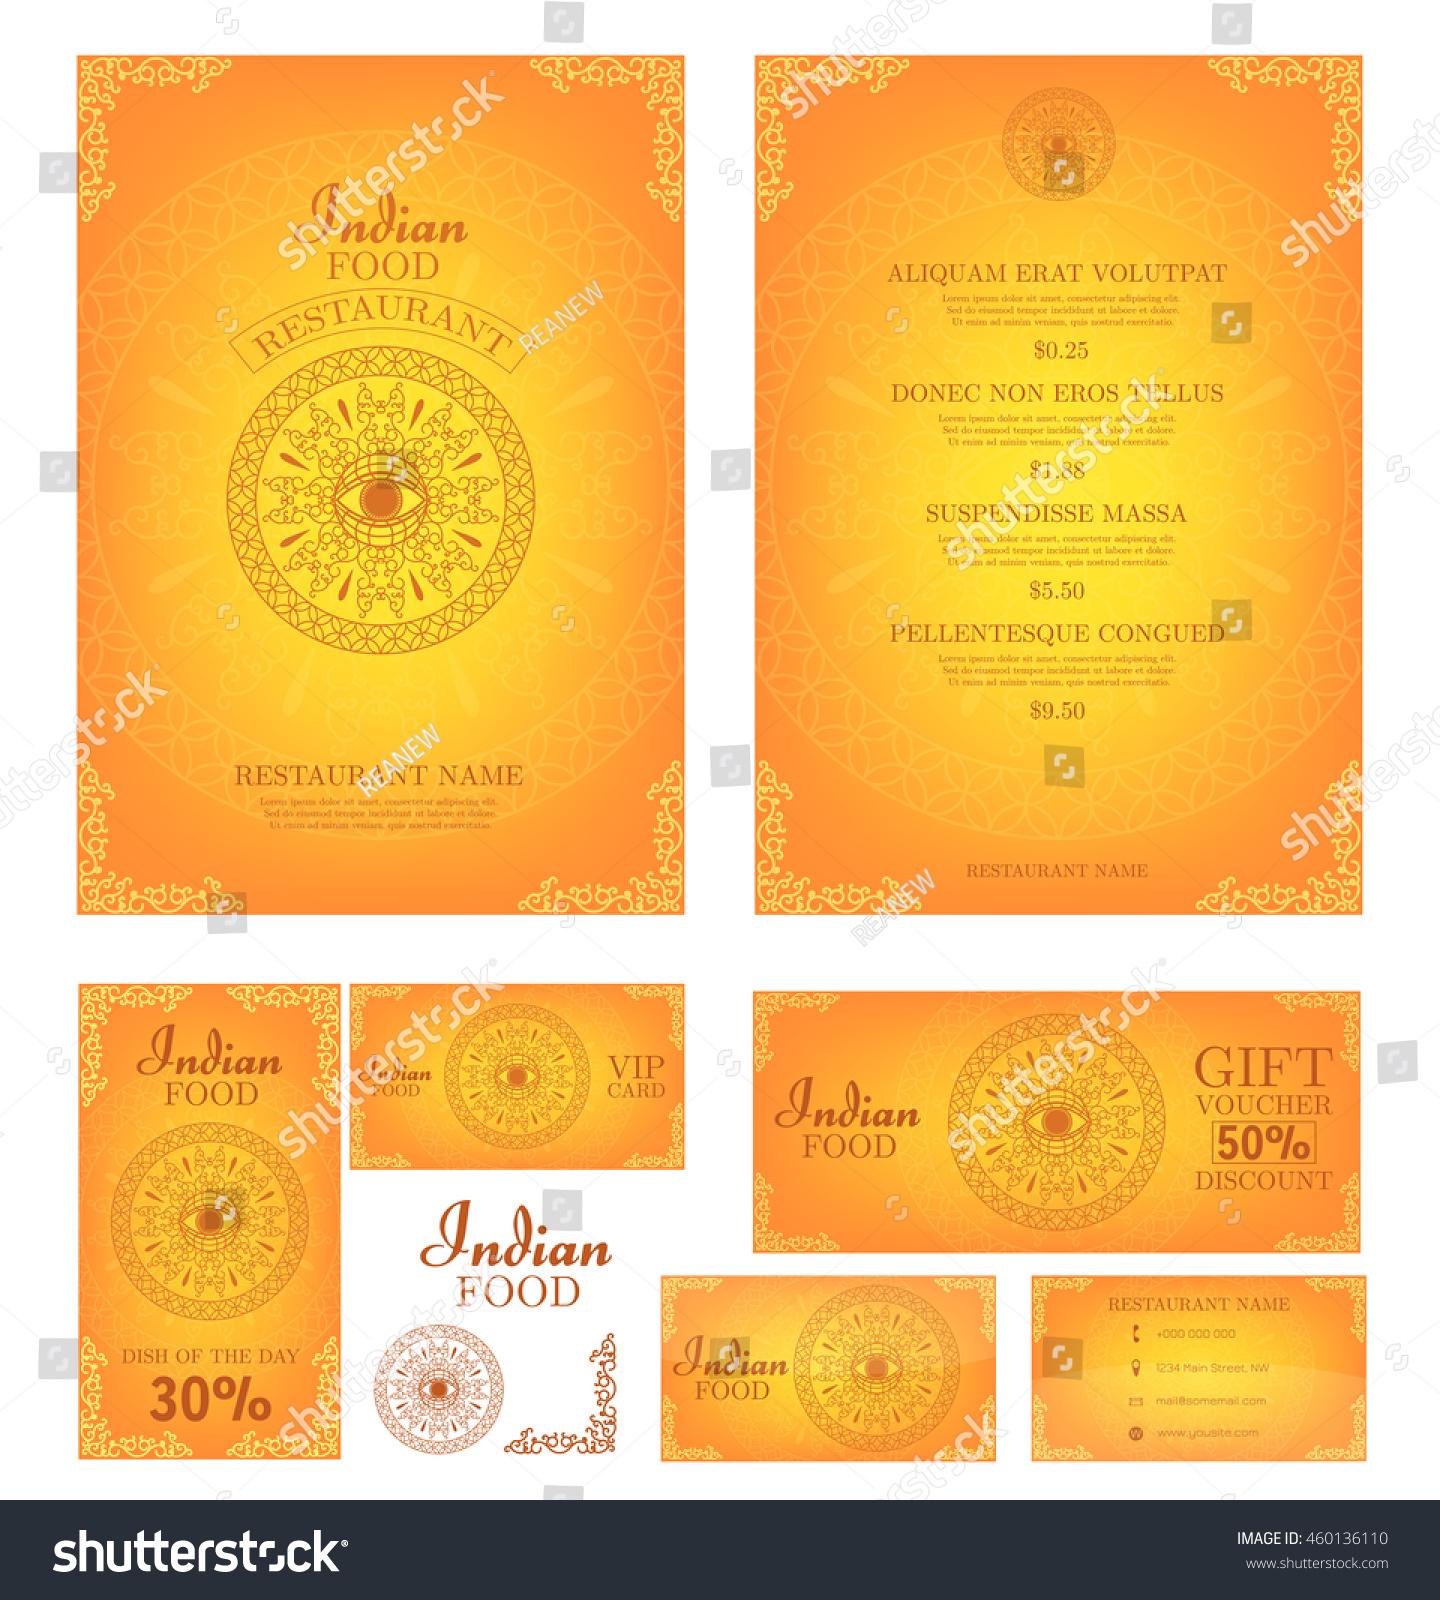 Indian Food Restaurant Menu Template Food Stock Vector 460136110 ...